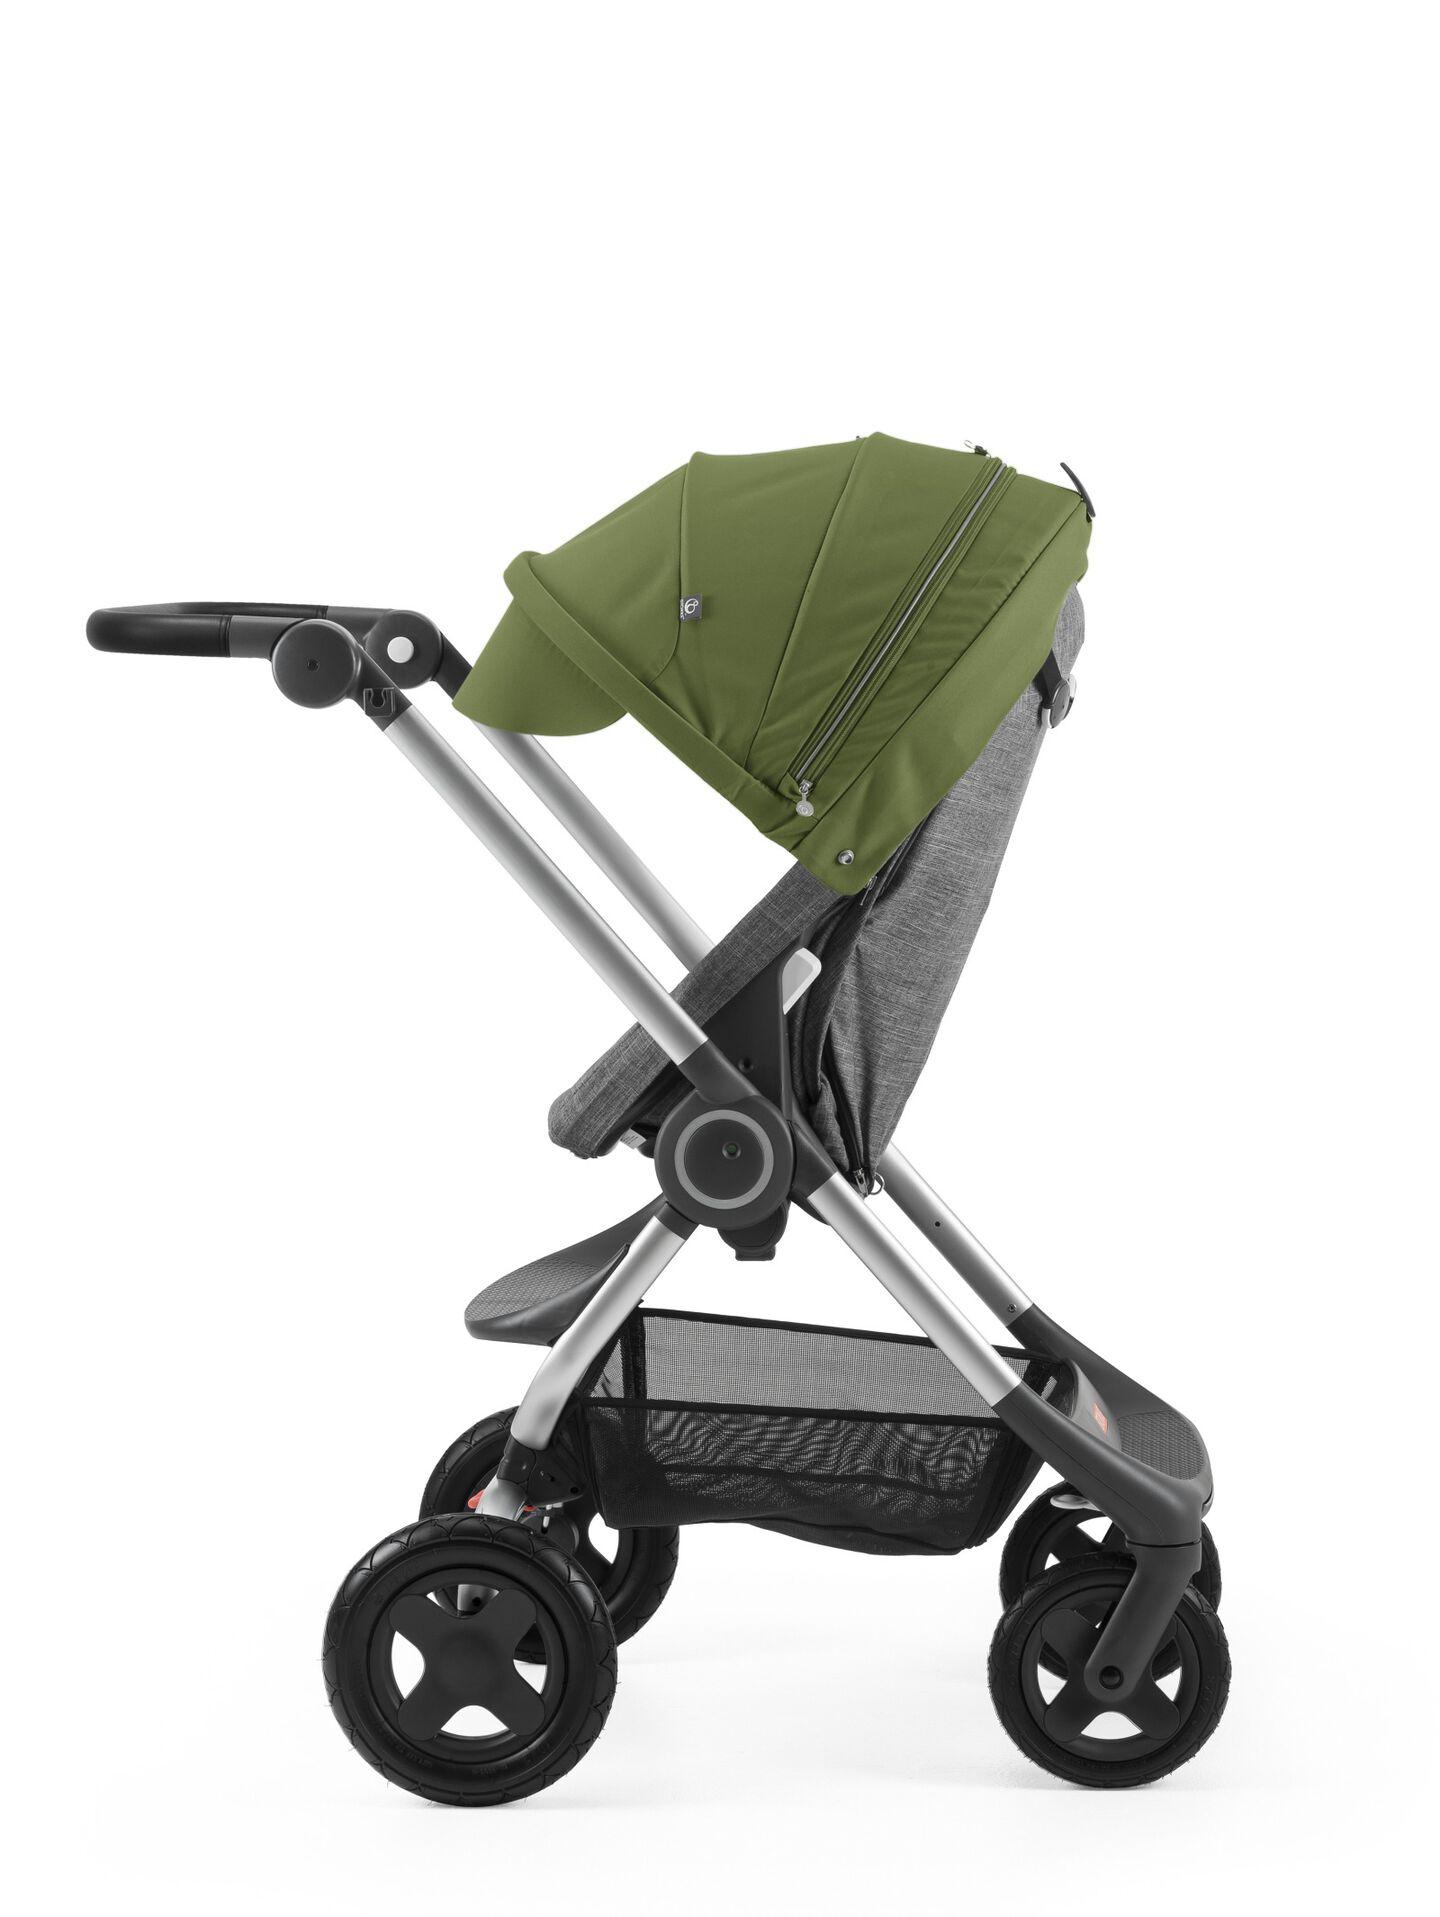 Stokke® Scoot™ Black Melange with Green Canopy. Parent facing, active position.